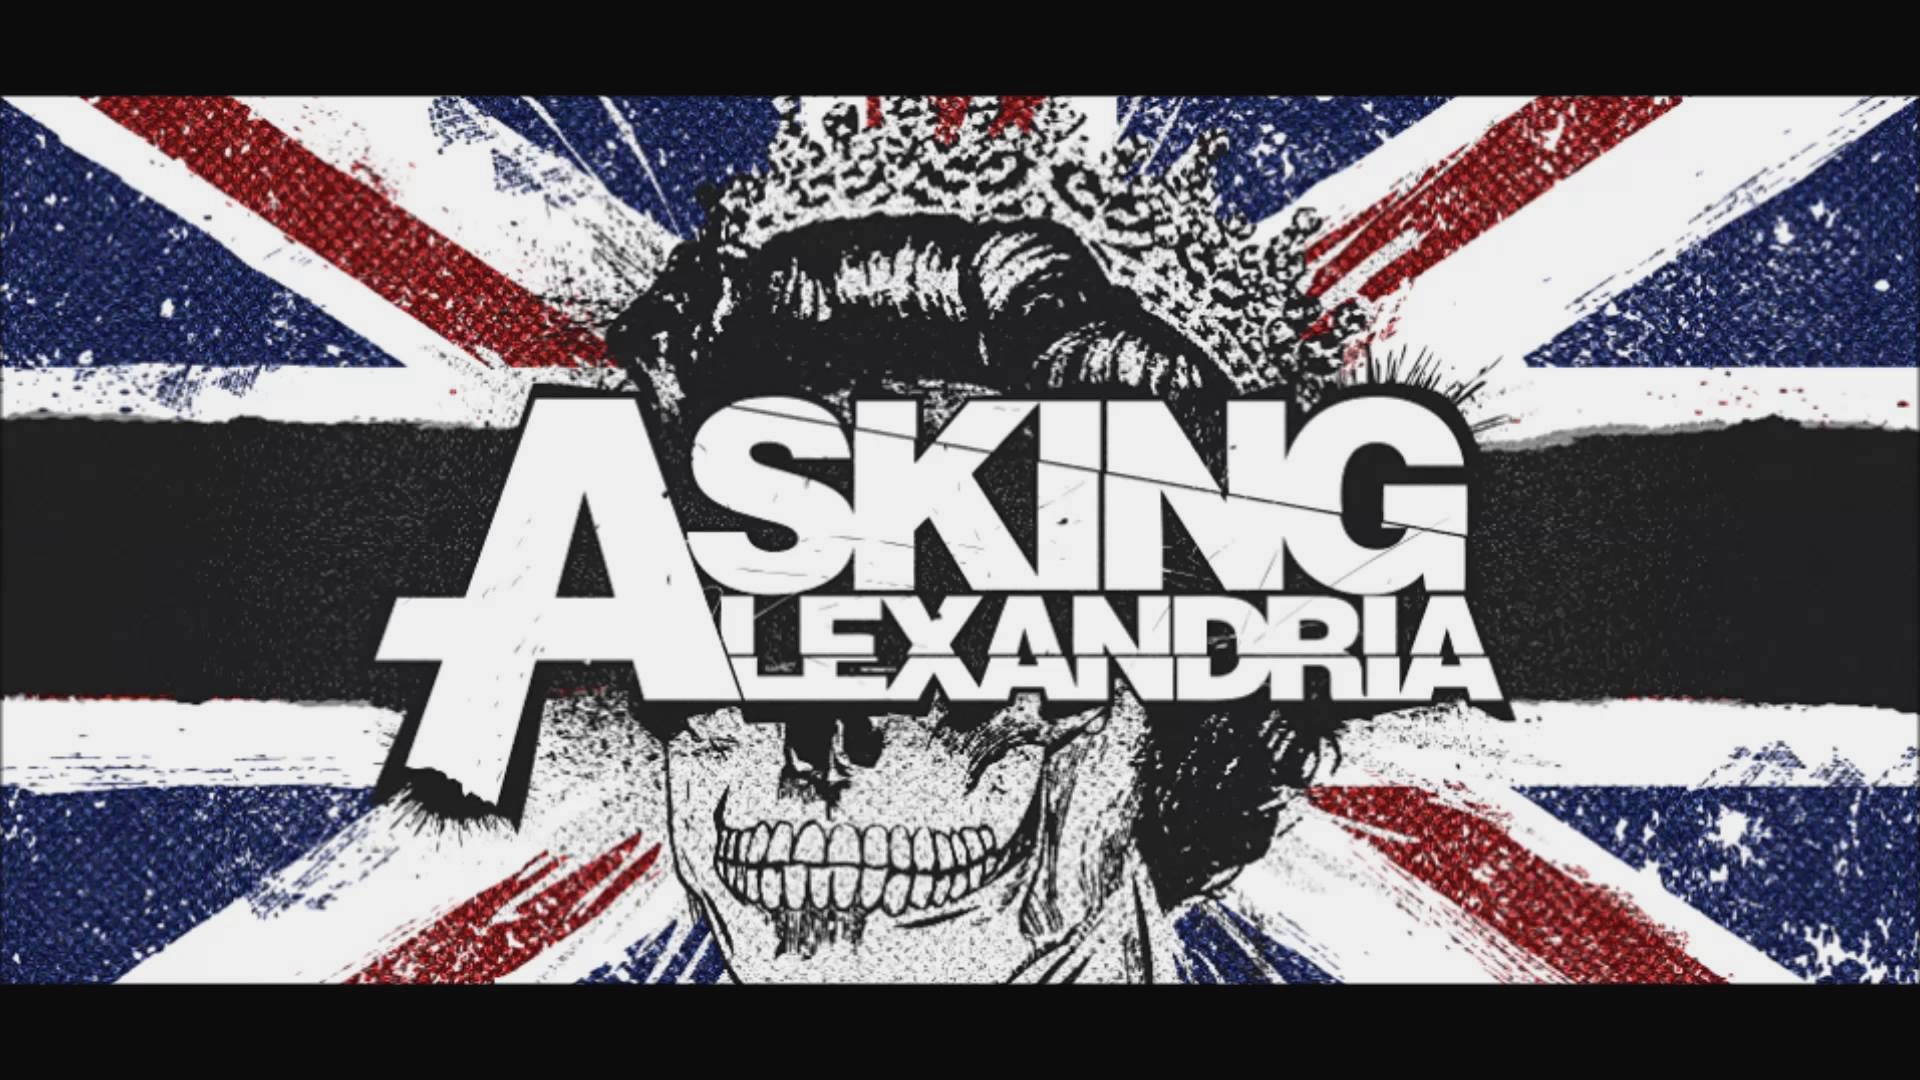 Asking Alexandria Wallpapers Hd